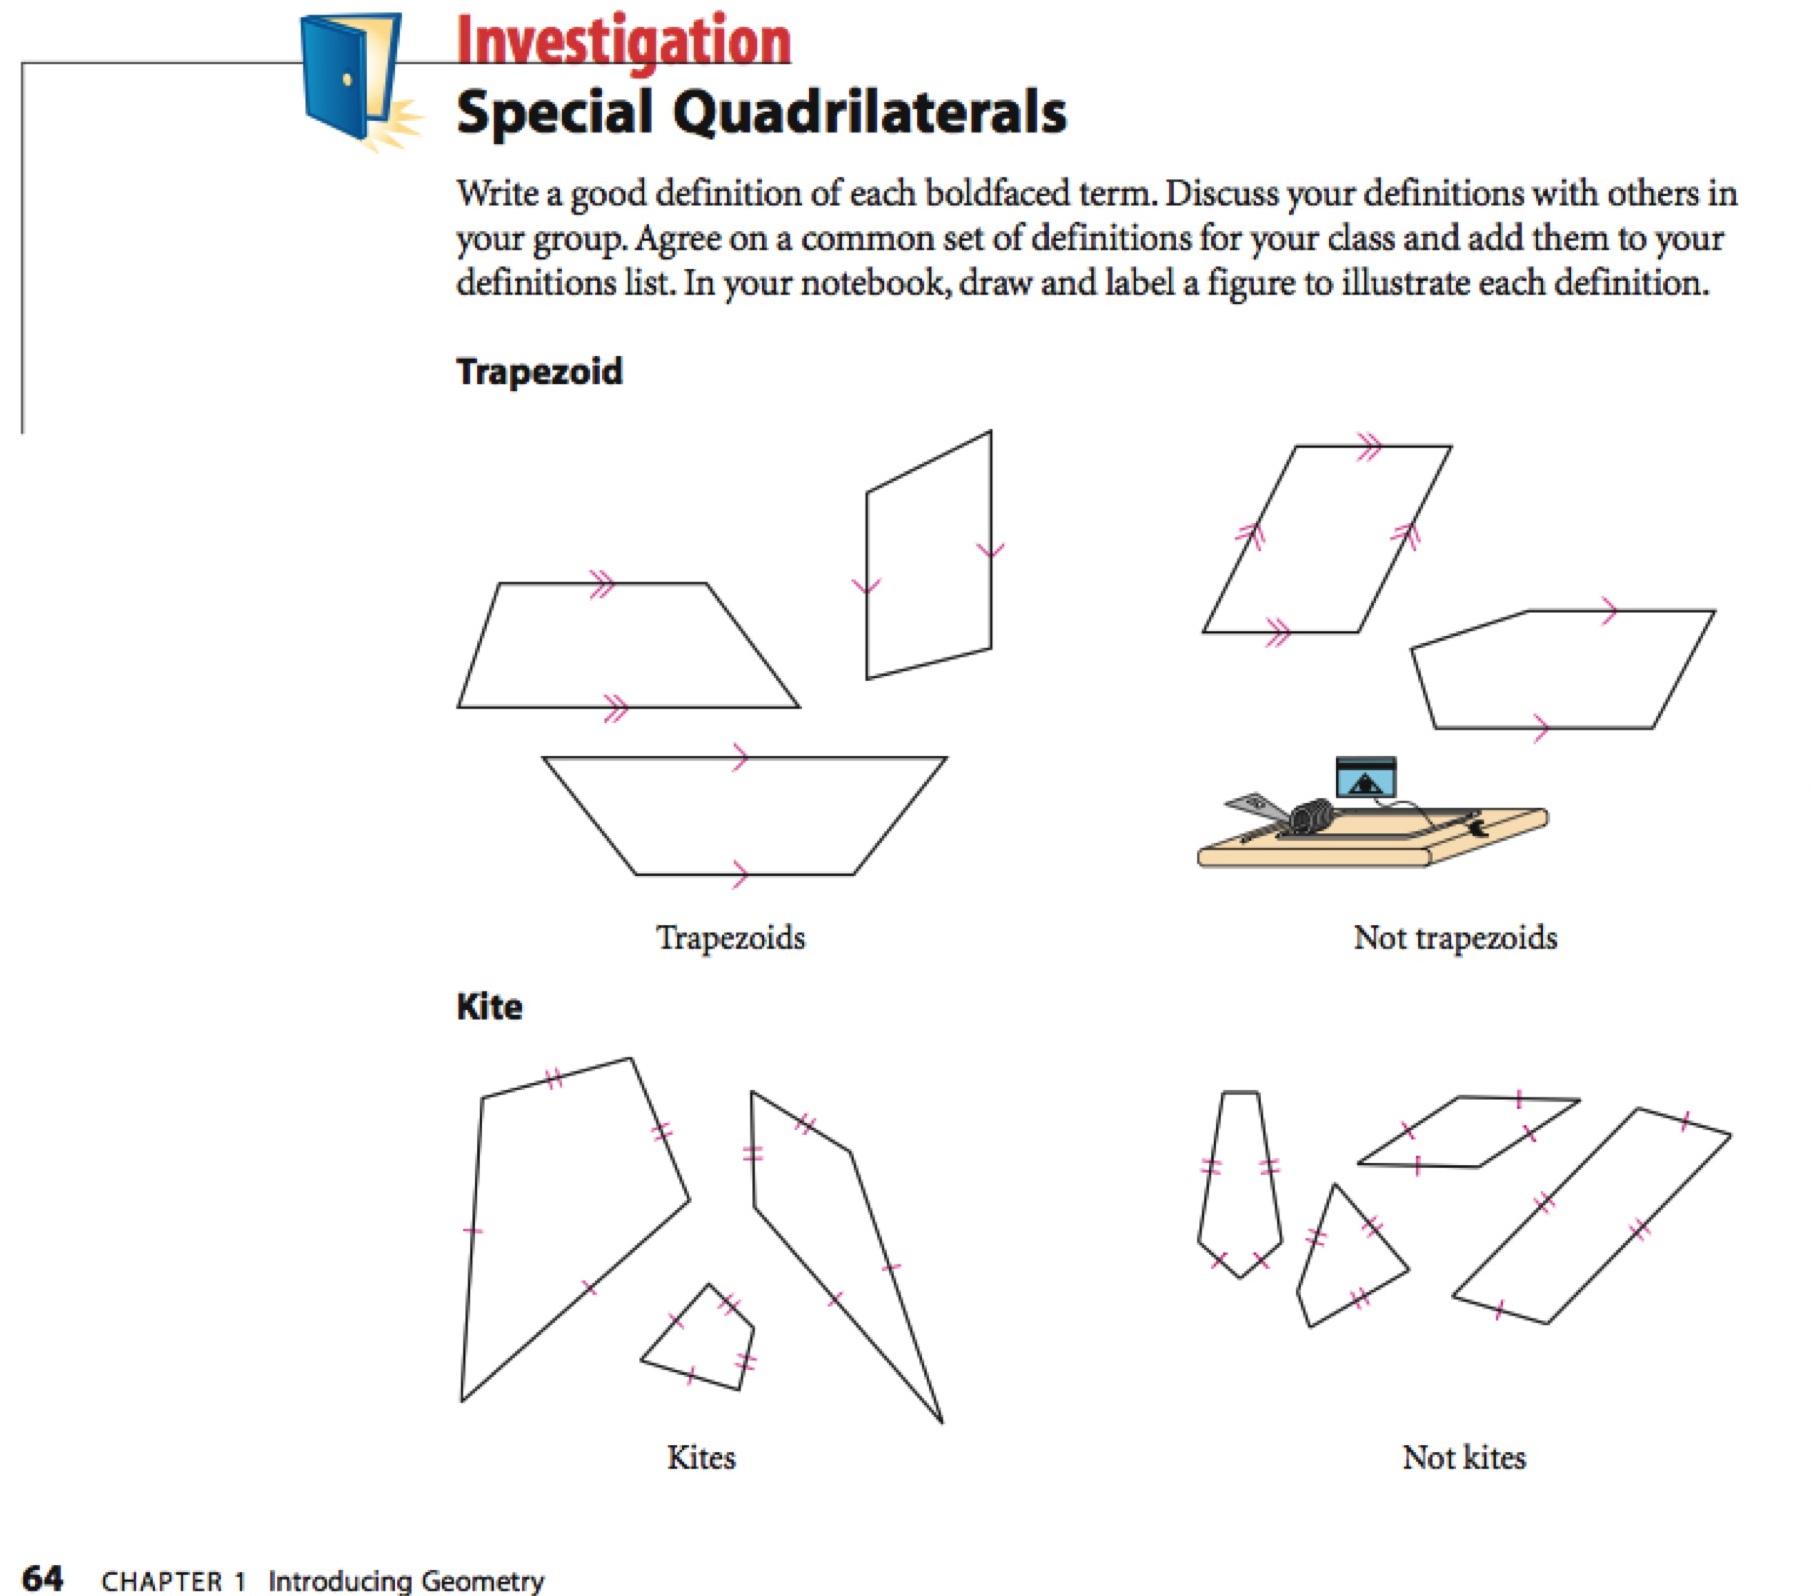 Worksheet Kites And Trapezoids Worksheet Answers Carlos Lomas